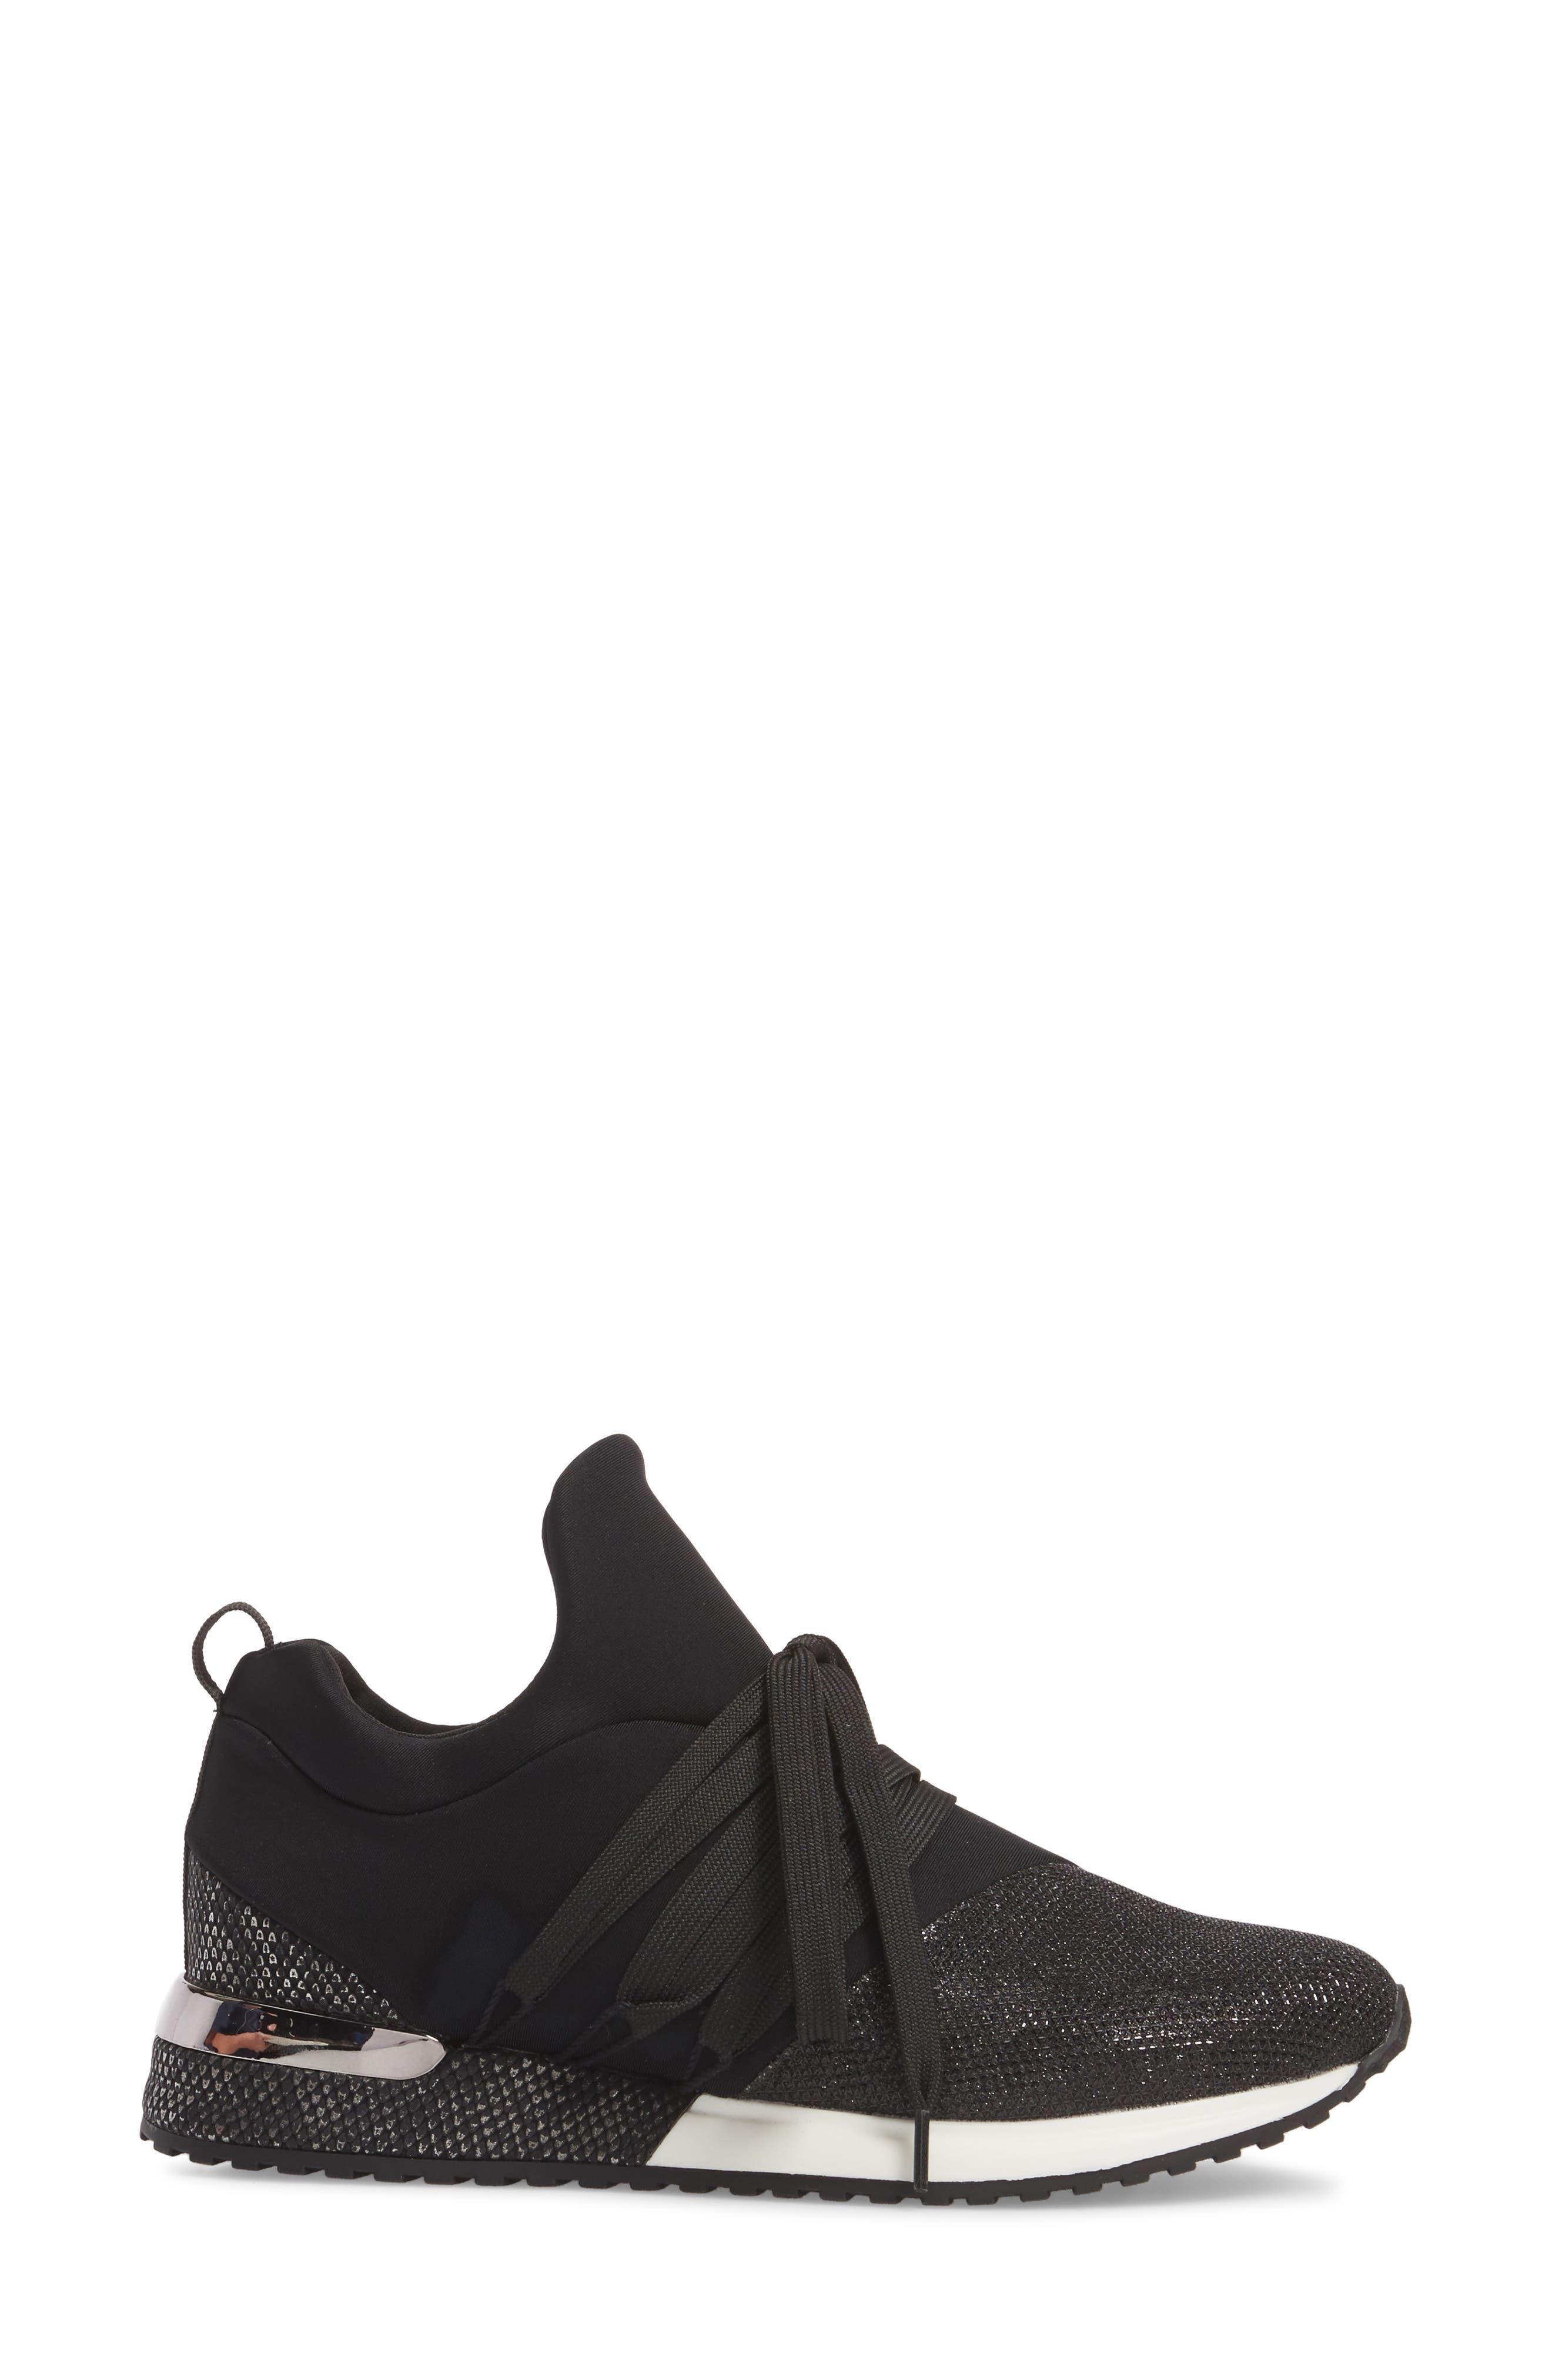 Zorro Sneaker,                             Alternate thumbnail 3, color,                             BLACK FABRIC